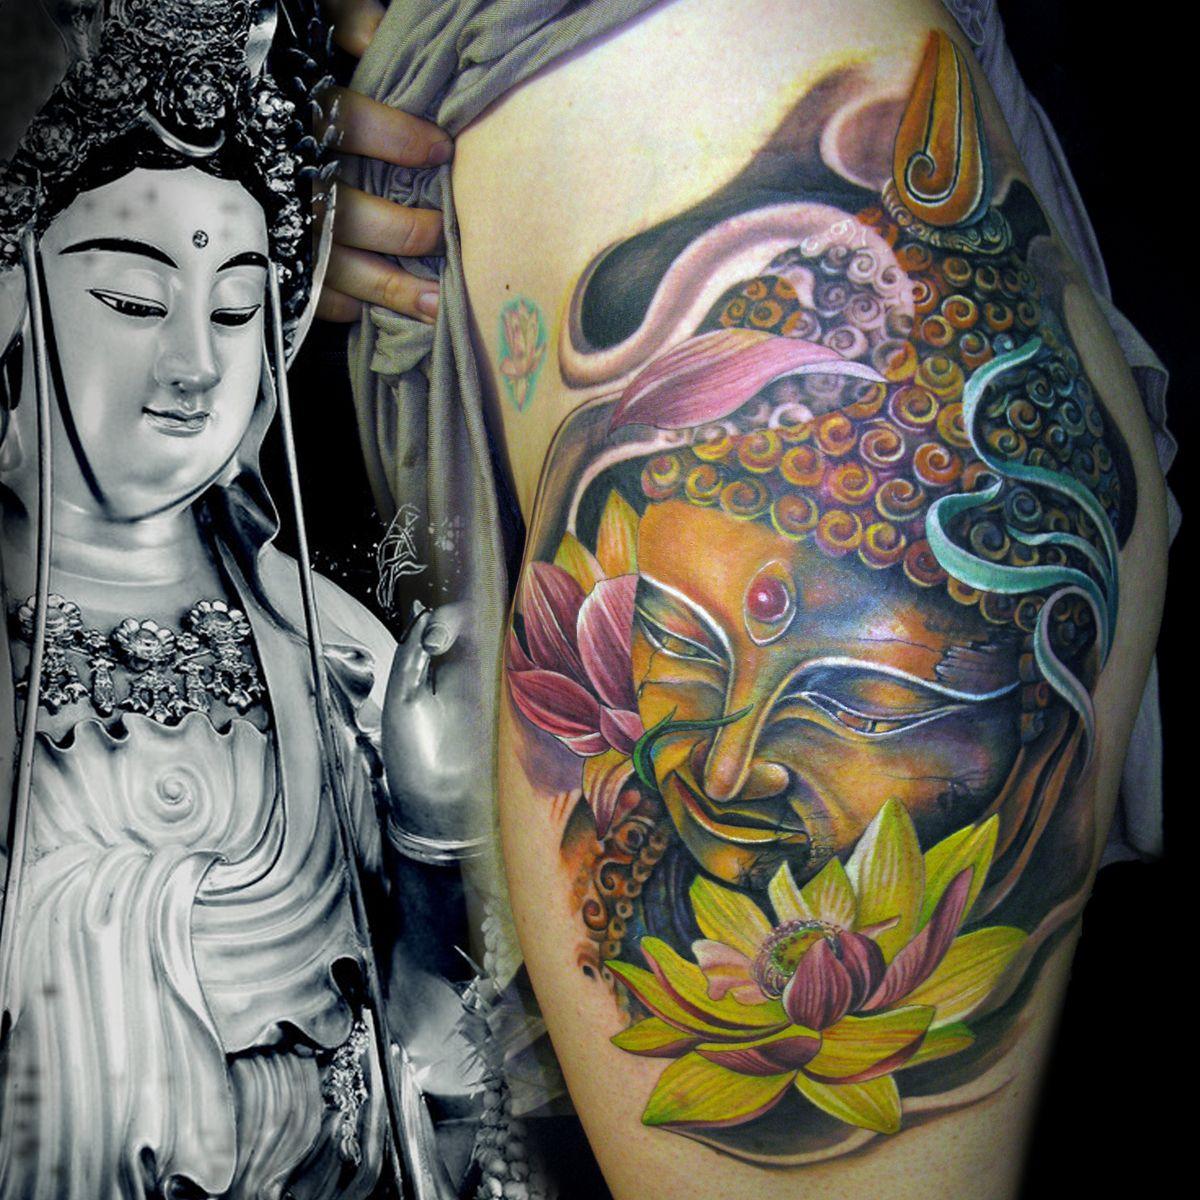 Stefan sinclair of two hands tattoo in auckland tatuajes stefan sinclair of two hands tattoo in auckland tatuajes pinterest tatuajes tinta y piel izmirmasajfo